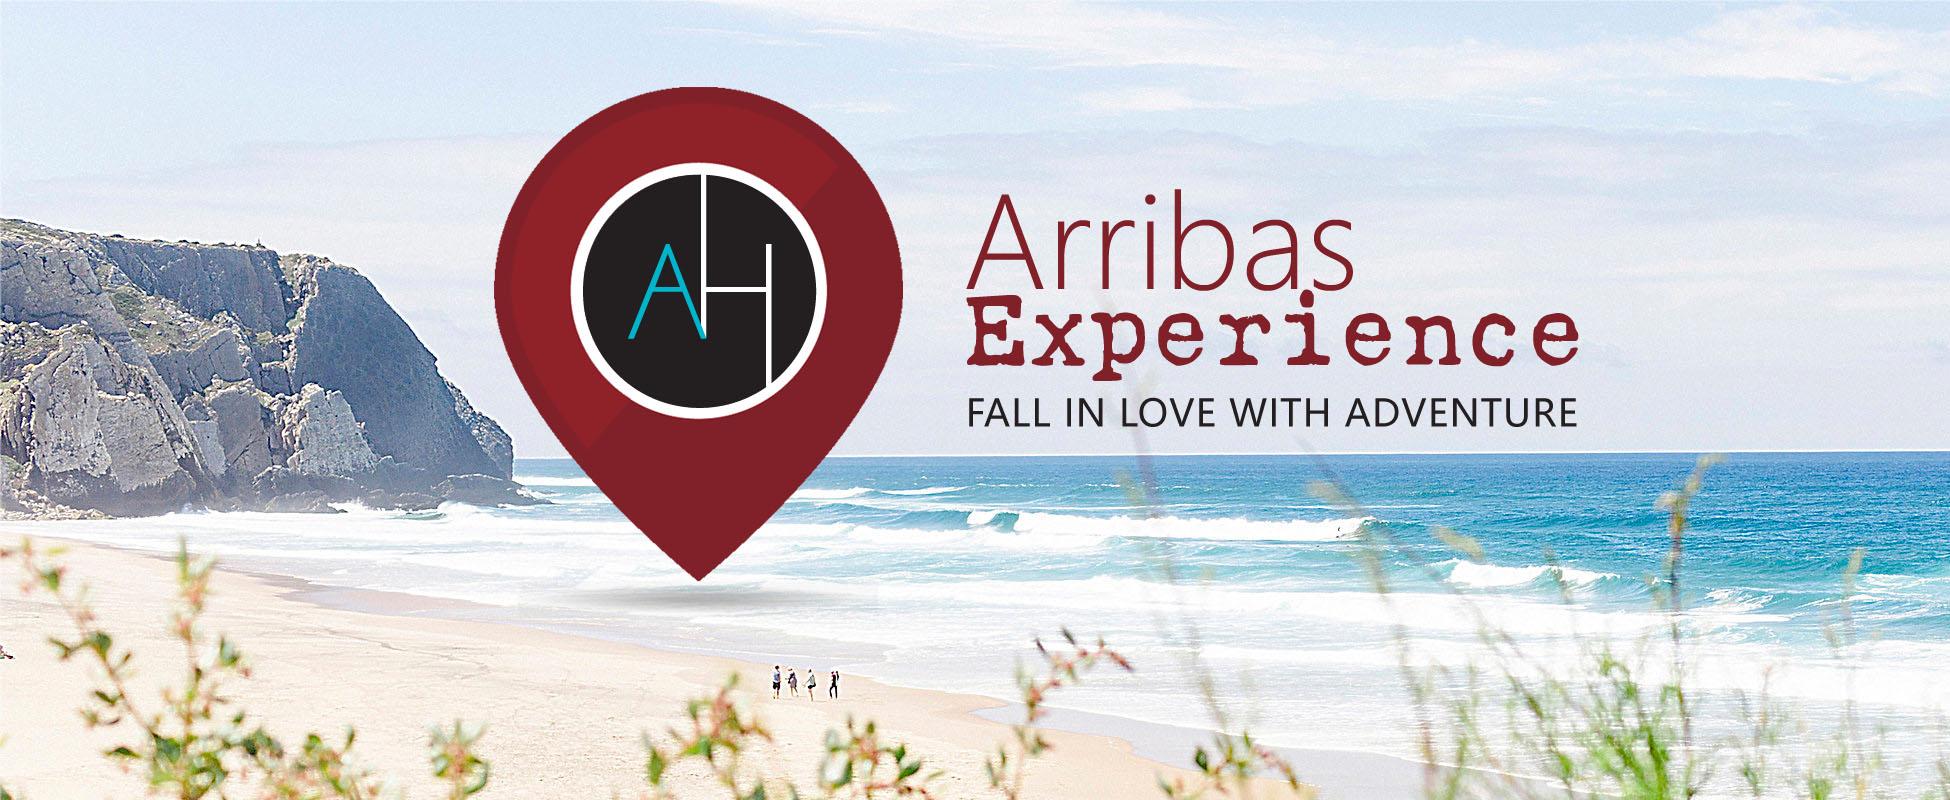 Arribas Experience disponível desde 1 de Julho de 2018.